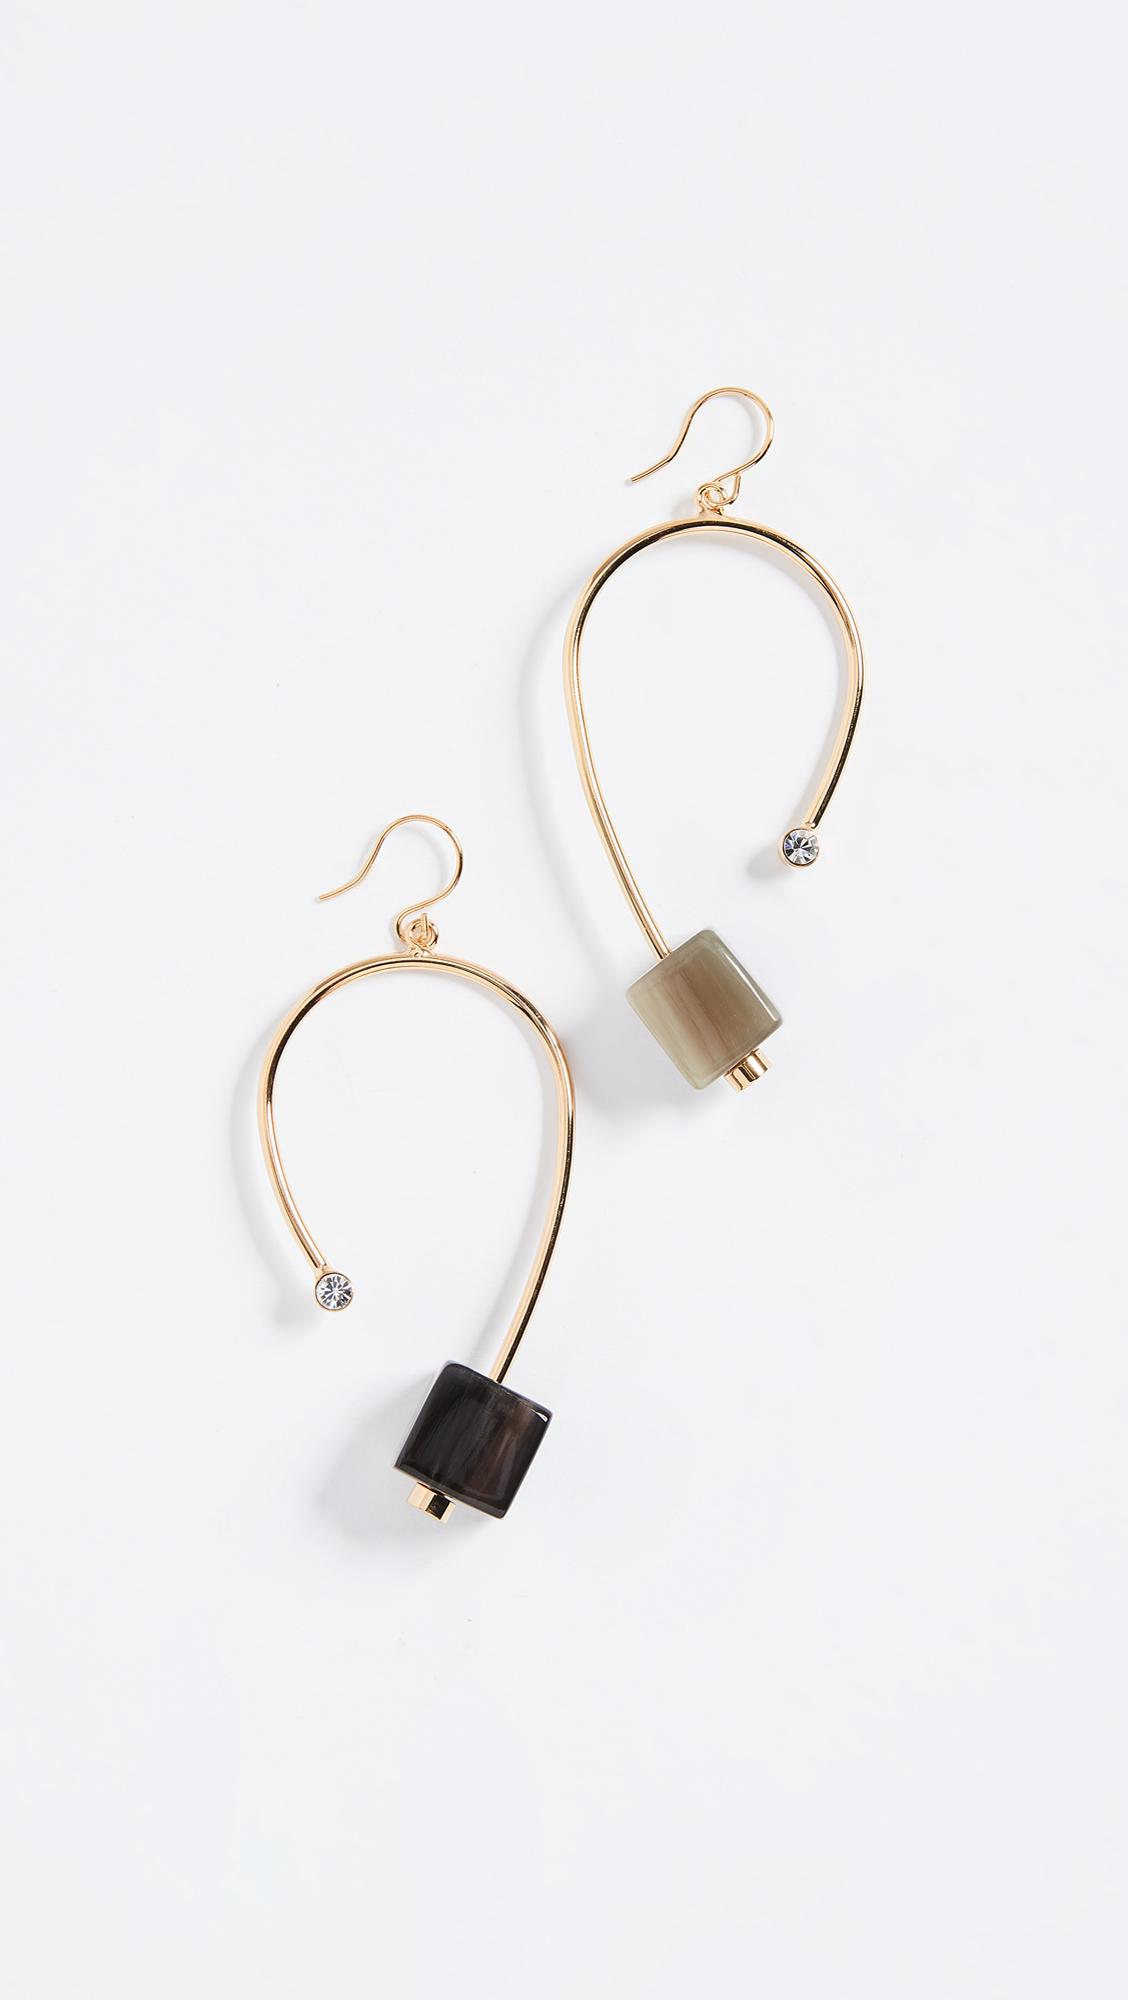 Marni Metal Horn Strass Earrings KavBxvo5F